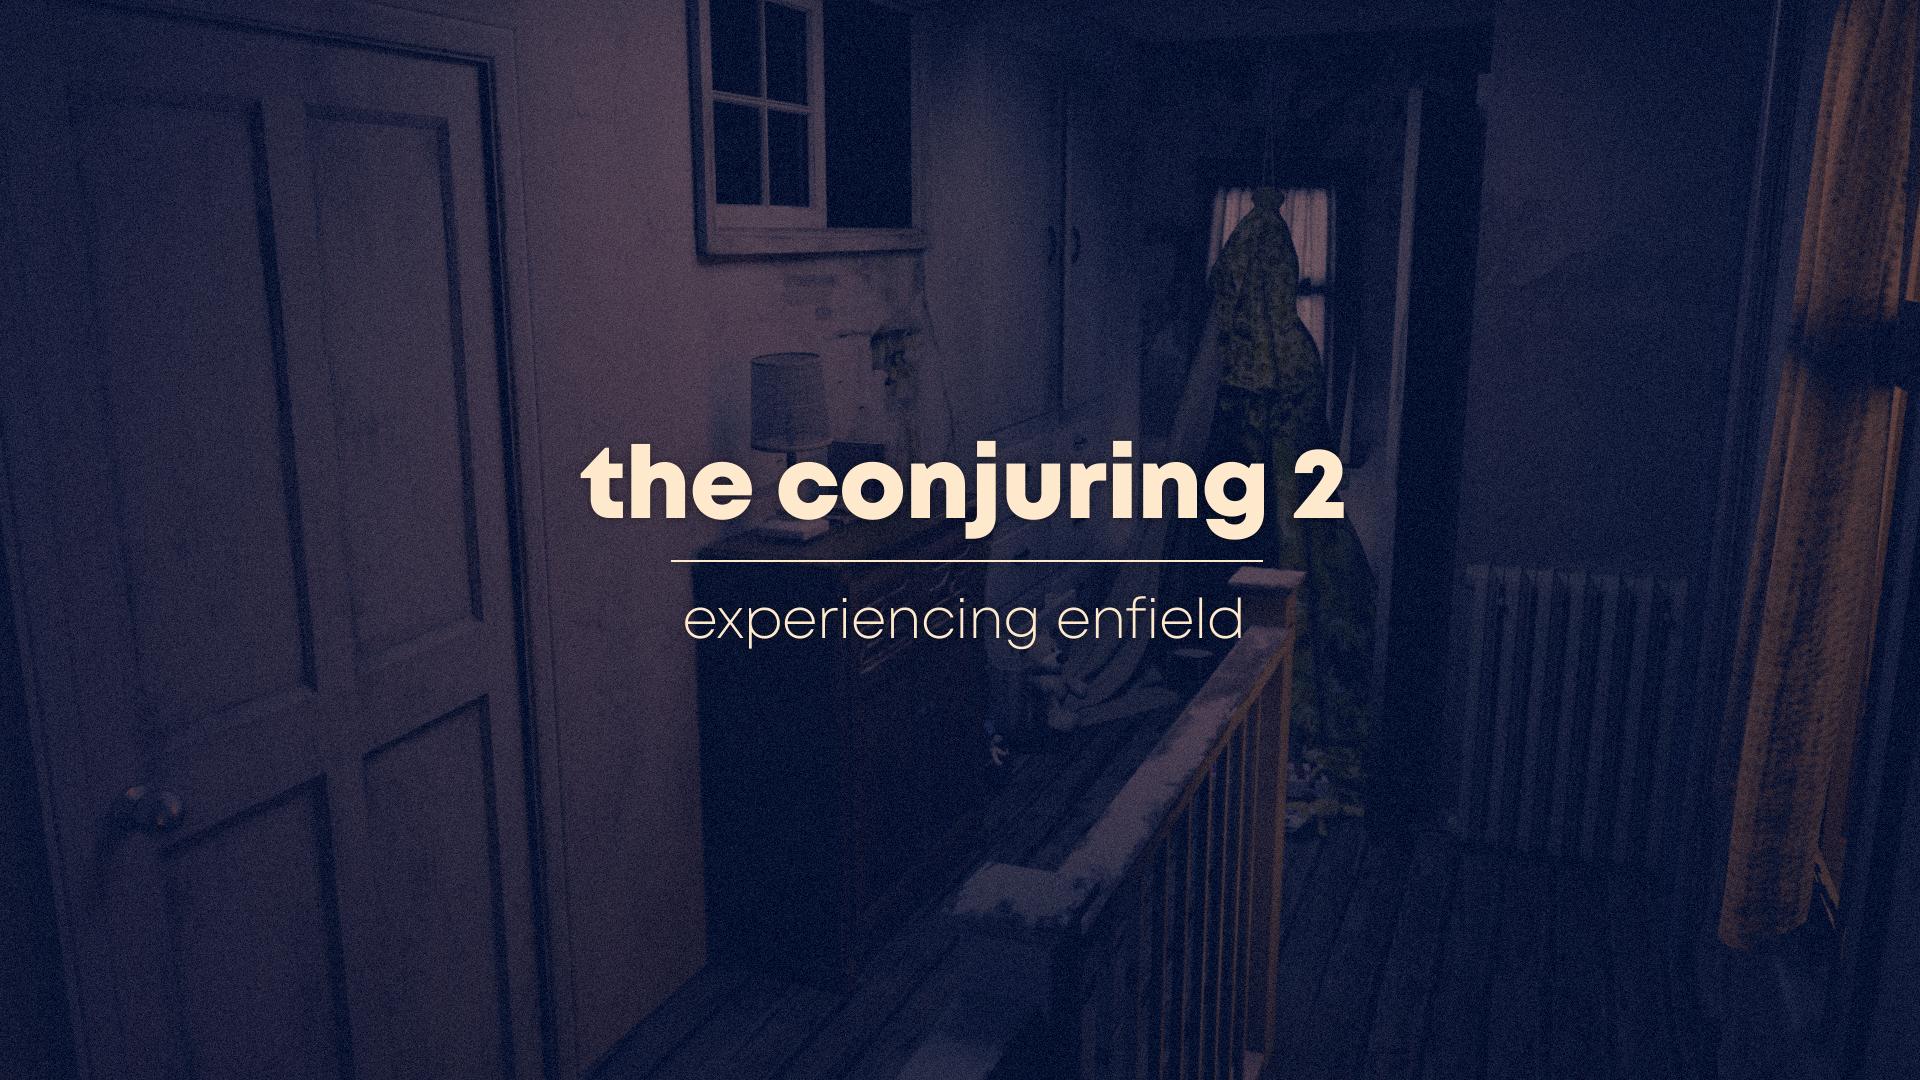 thumb_04_conjuring2enfield_v01.jpg